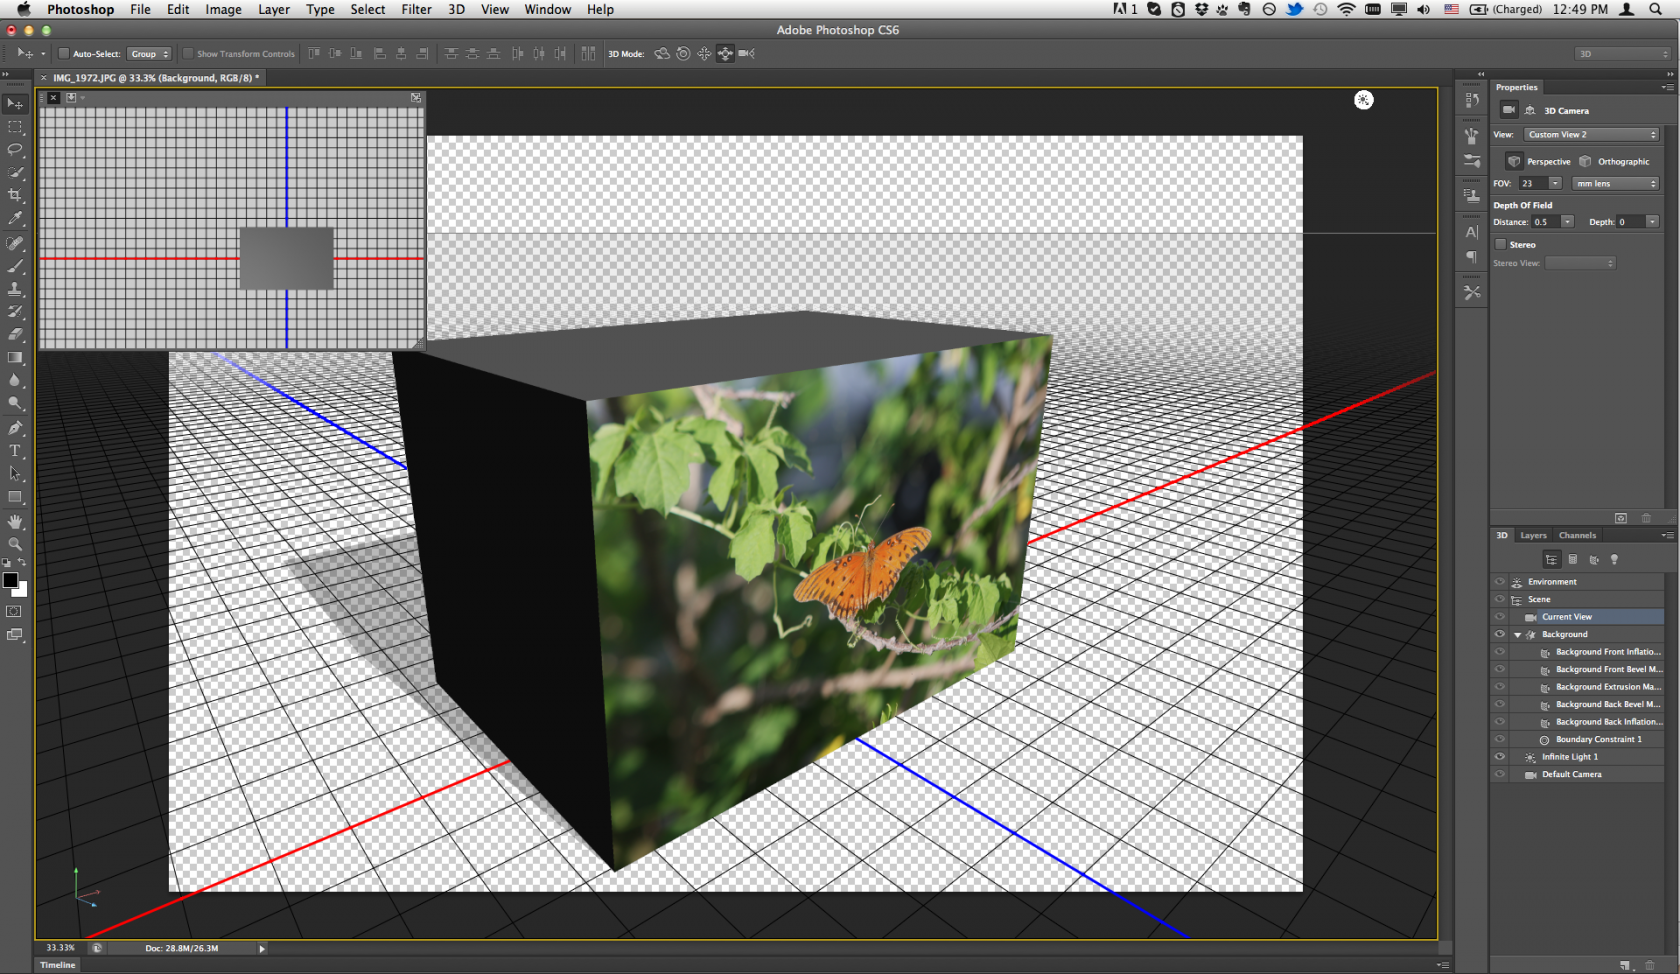 ... Adobe Photoshop CS6 Extended 13.0 for Mac 3D screenshot ...